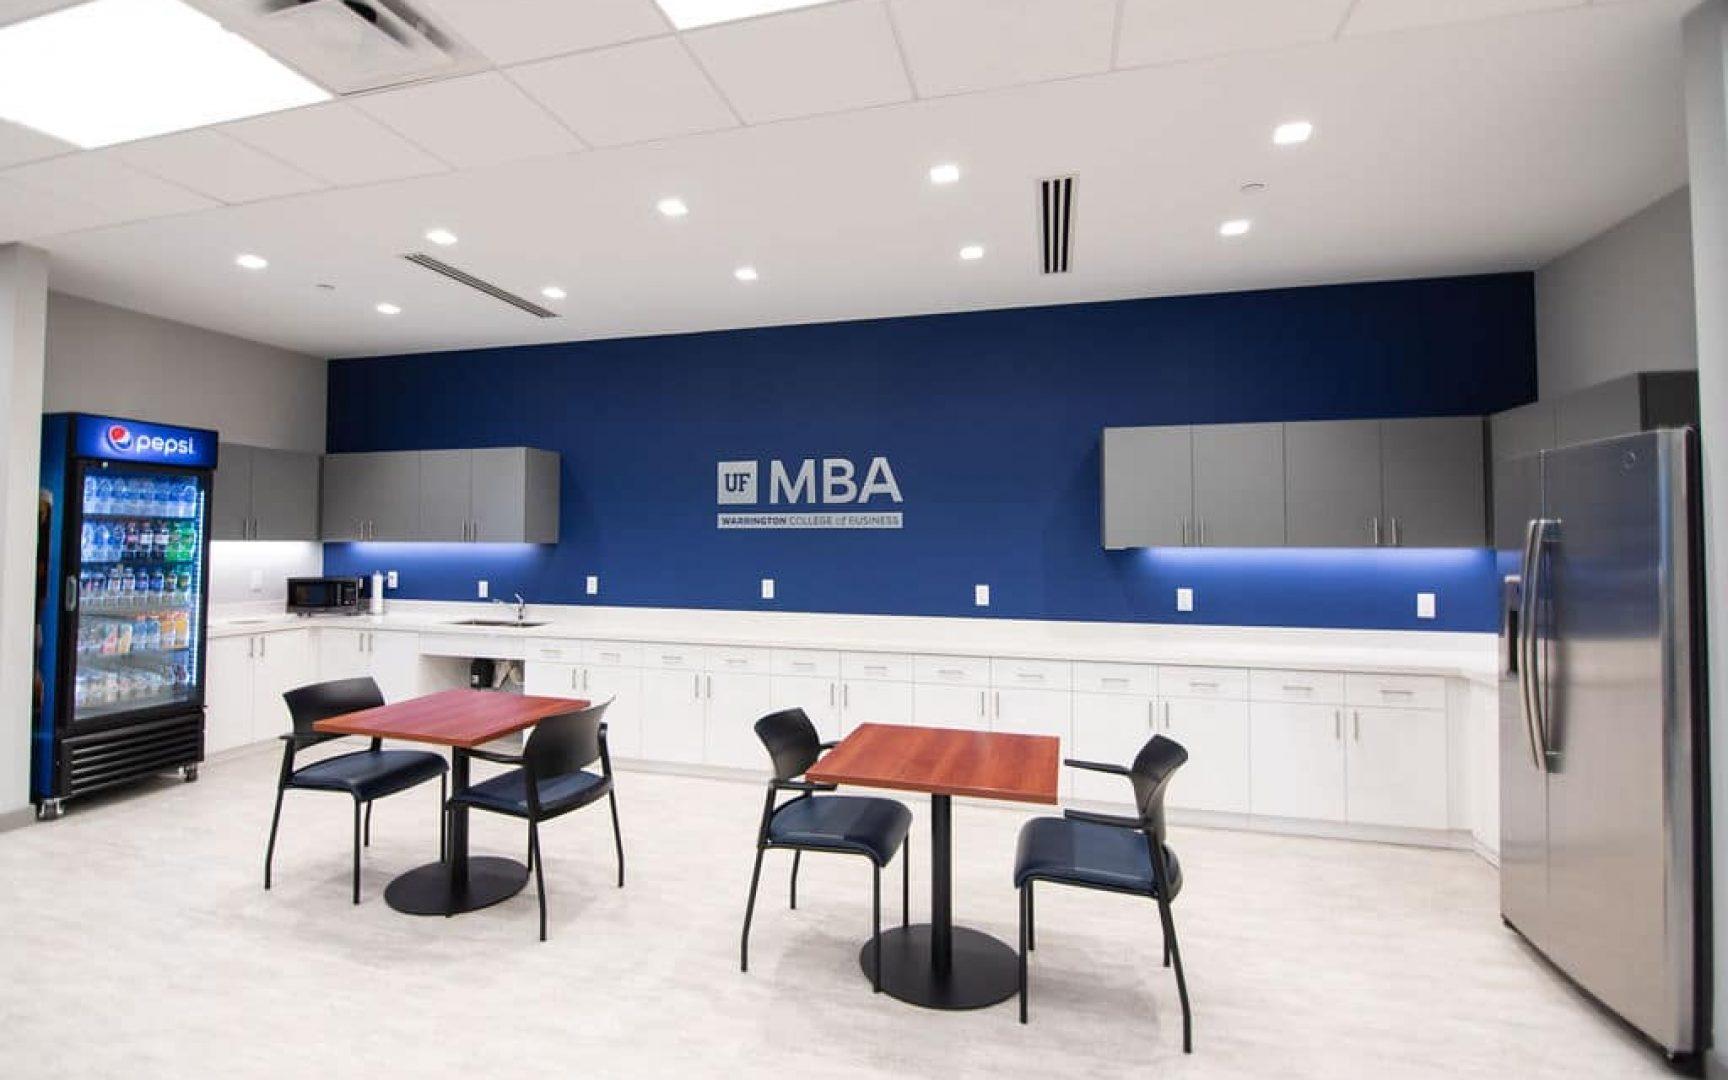 Kitchen area in UF MBA South Florida Miramar location